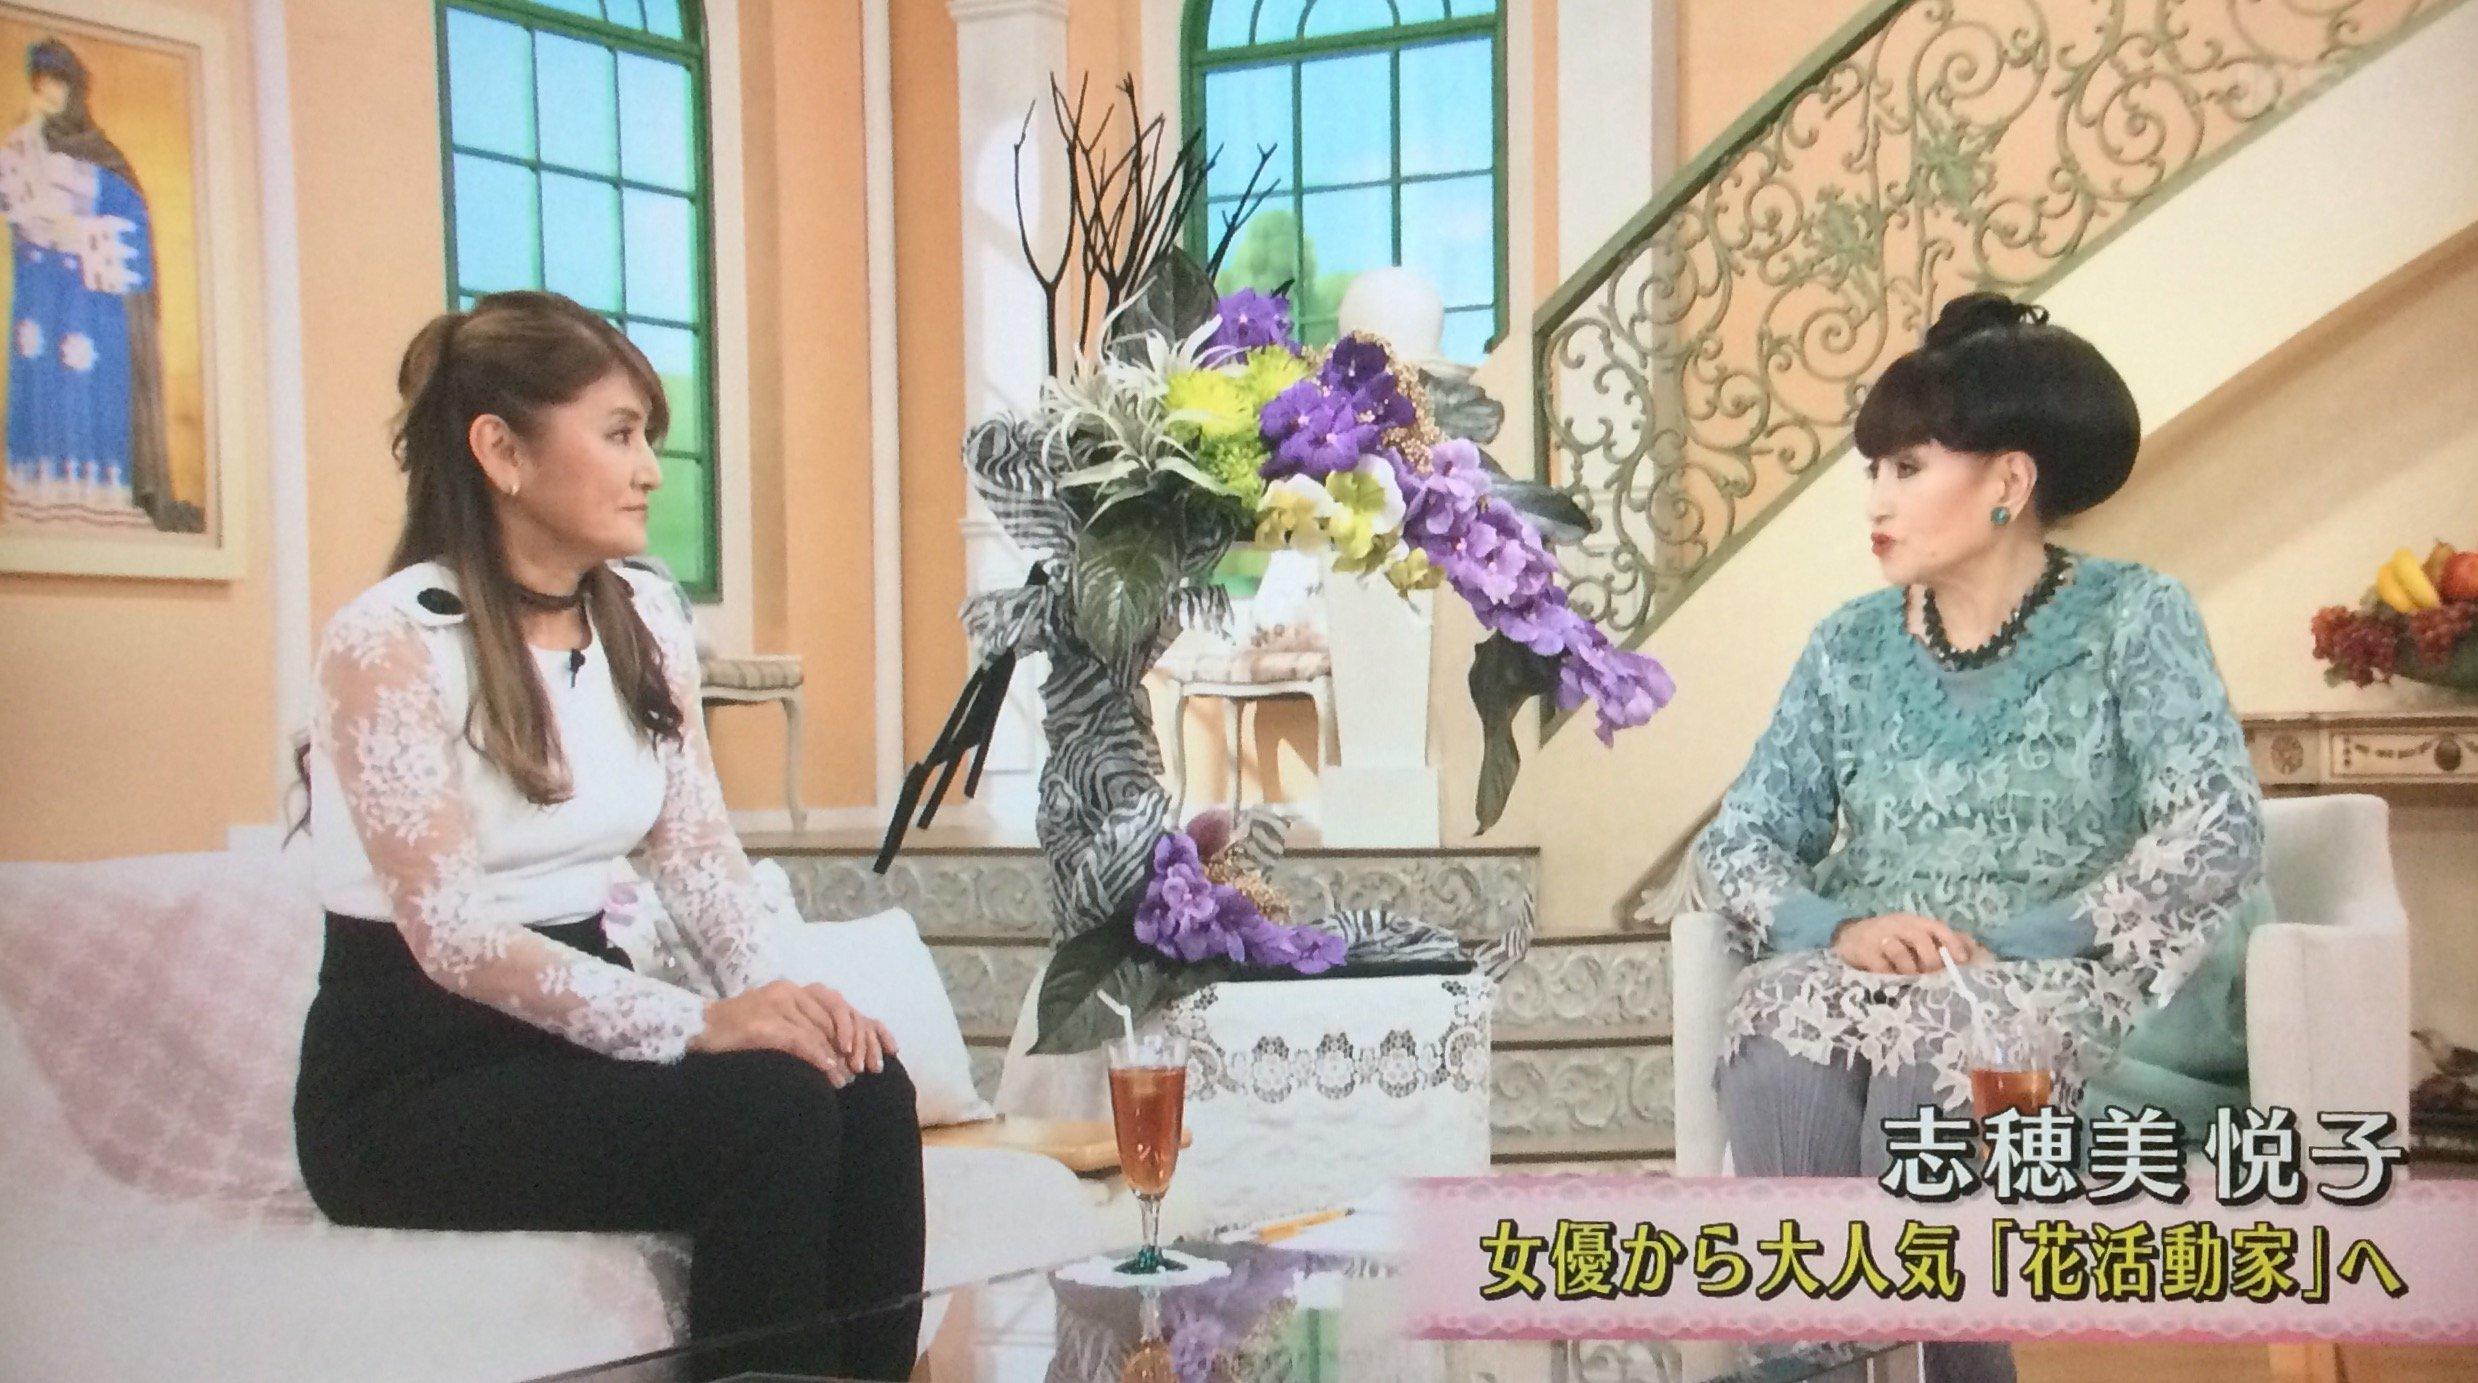 20 1 1.jpg?resize=1200,630 - アクション女優として活躍した志穂美悦子の現在